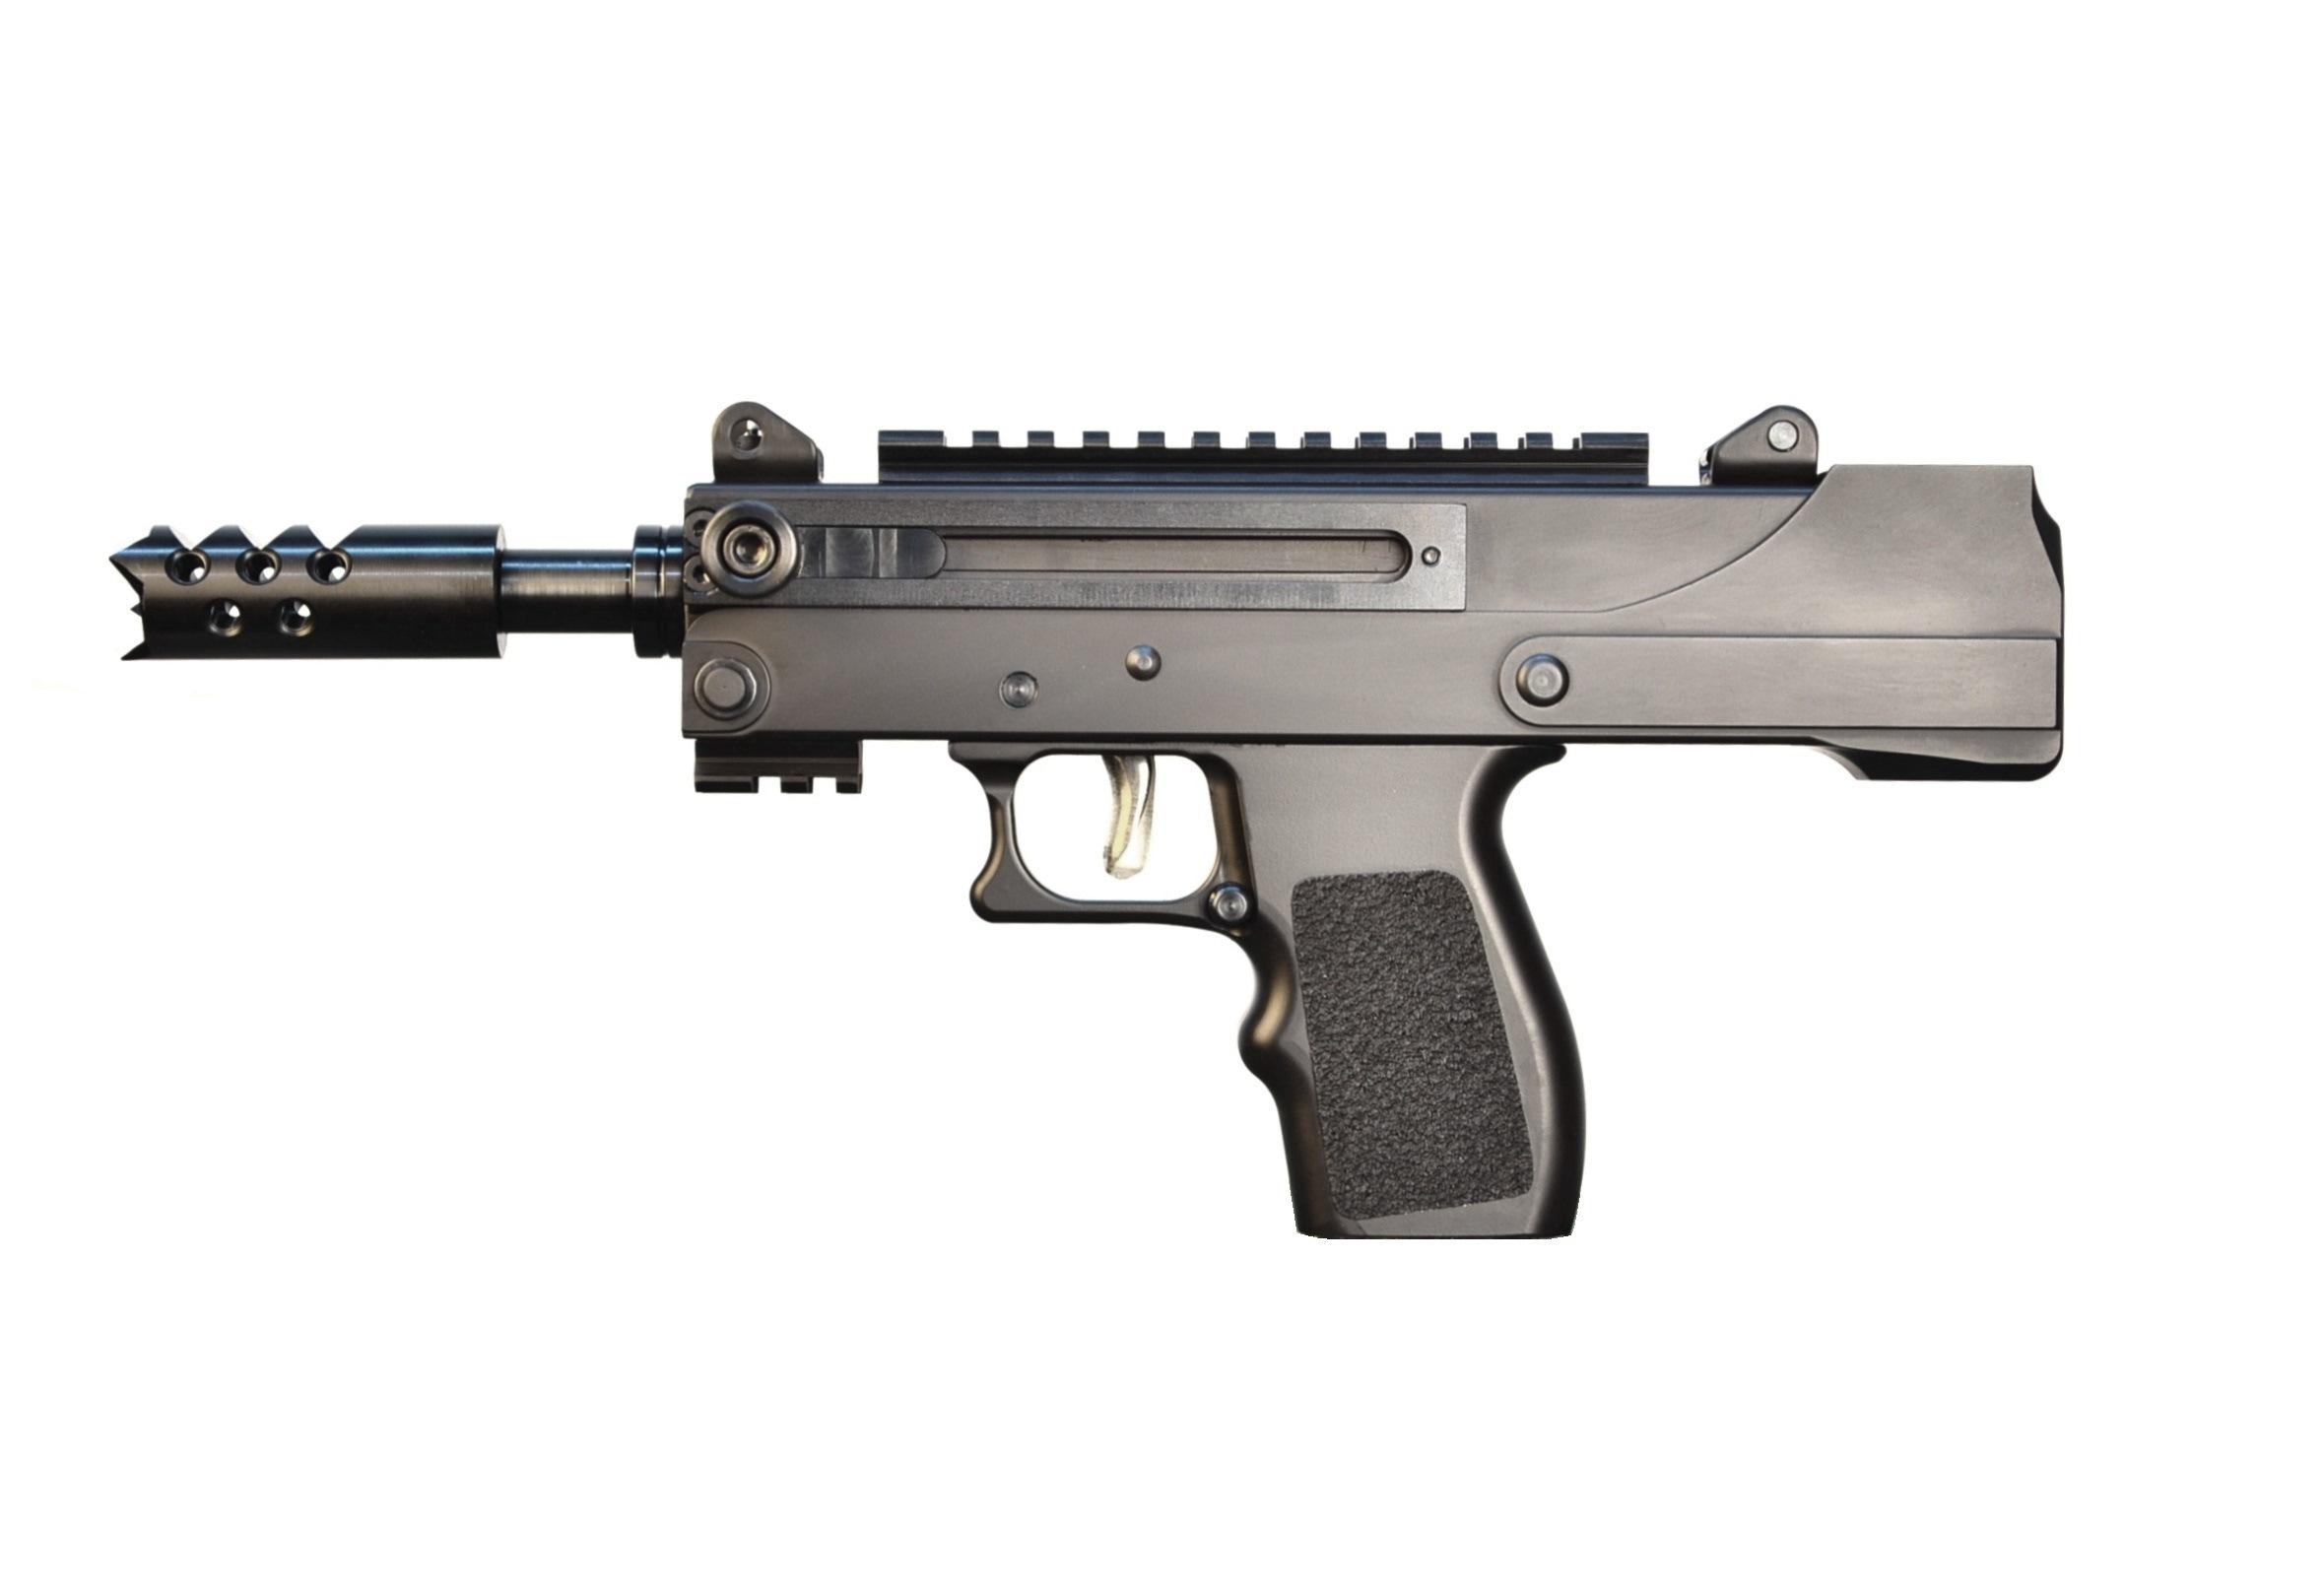 MPA57DMG 57x28mm Pistol  MasterPiece Arms Inc